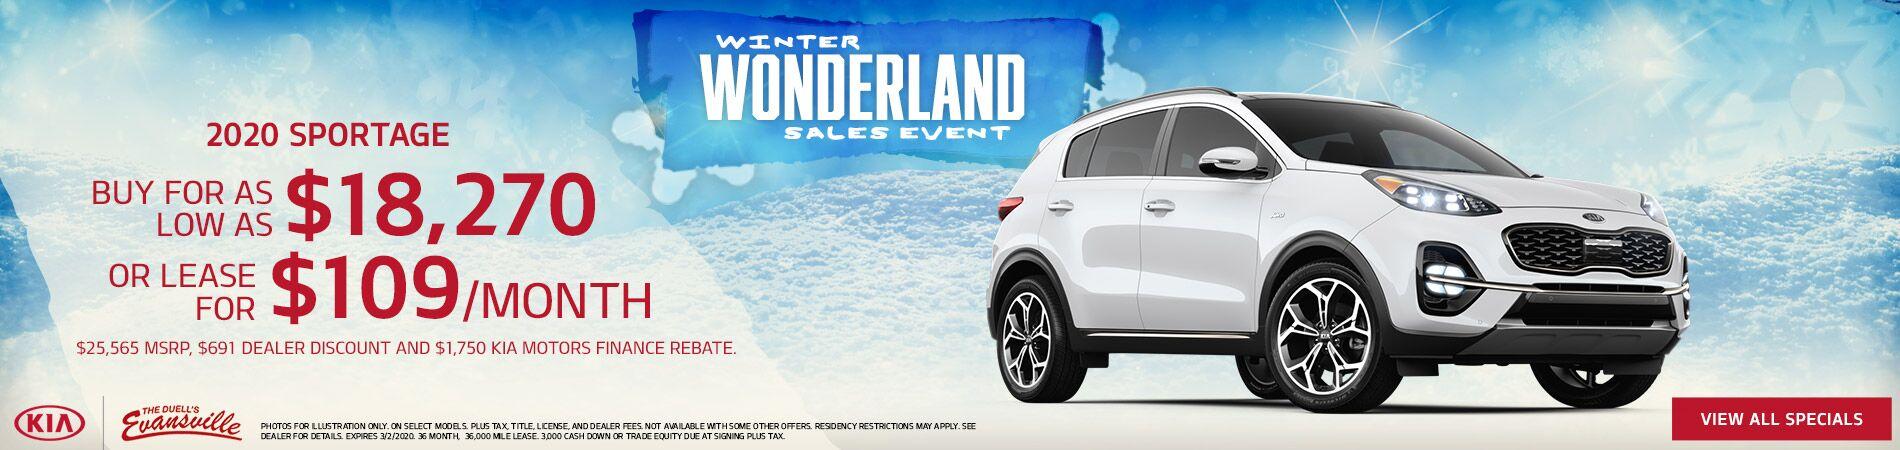 2020 Kia Sportage Special Offer   Evansville, IN